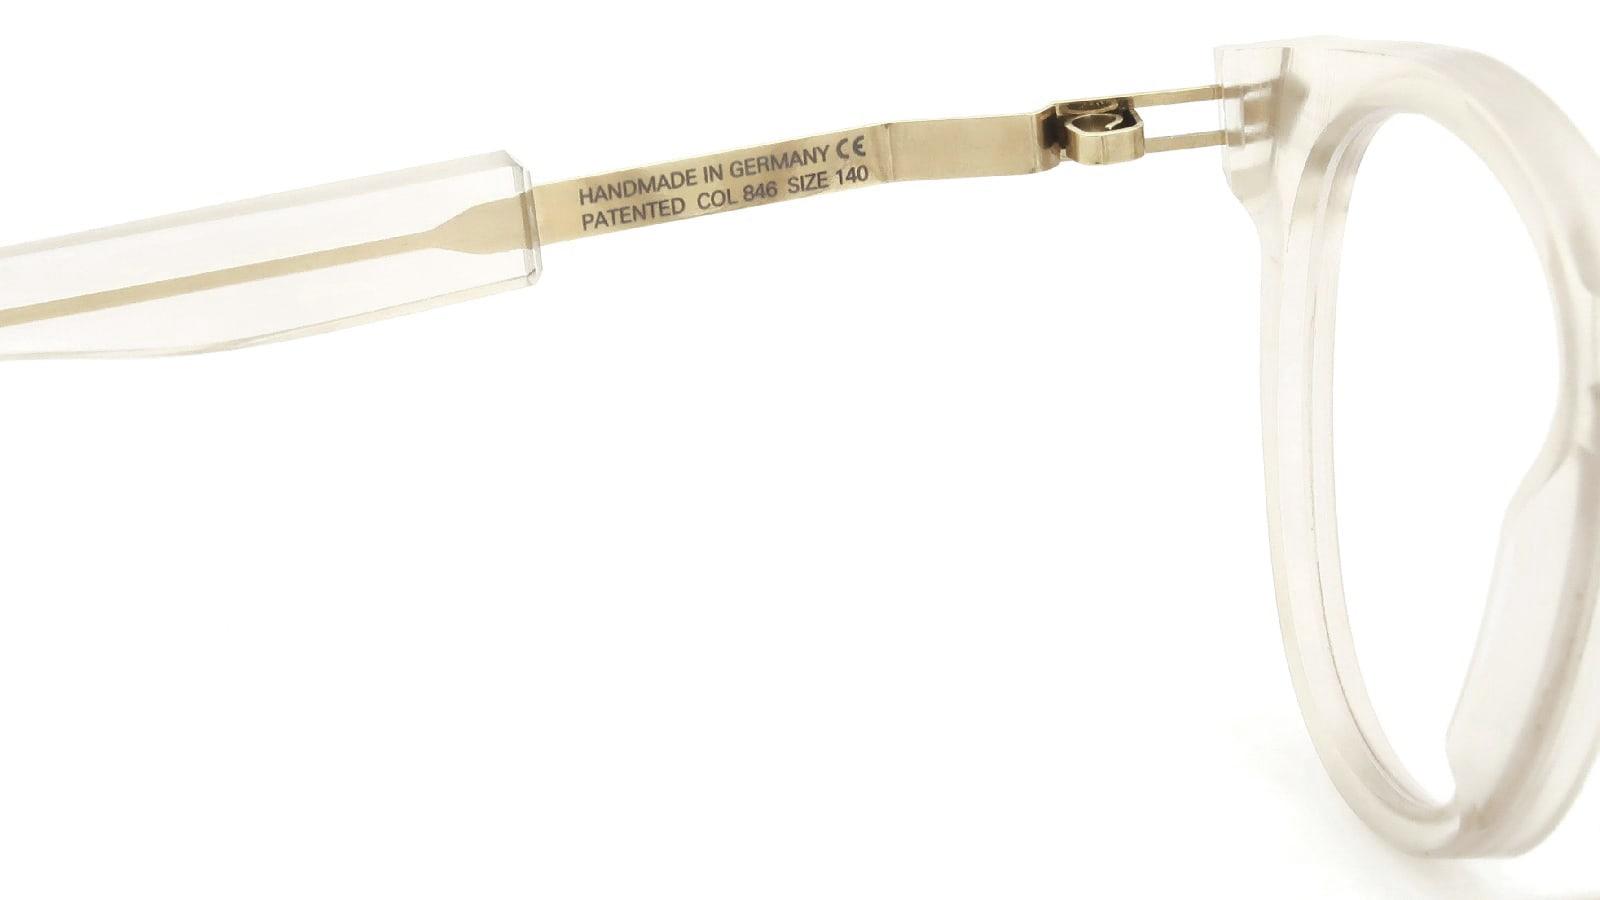 MYKITA + Maison Margiela MMRAW011 COL.846 Raw Champagne/Glossy Gold 9